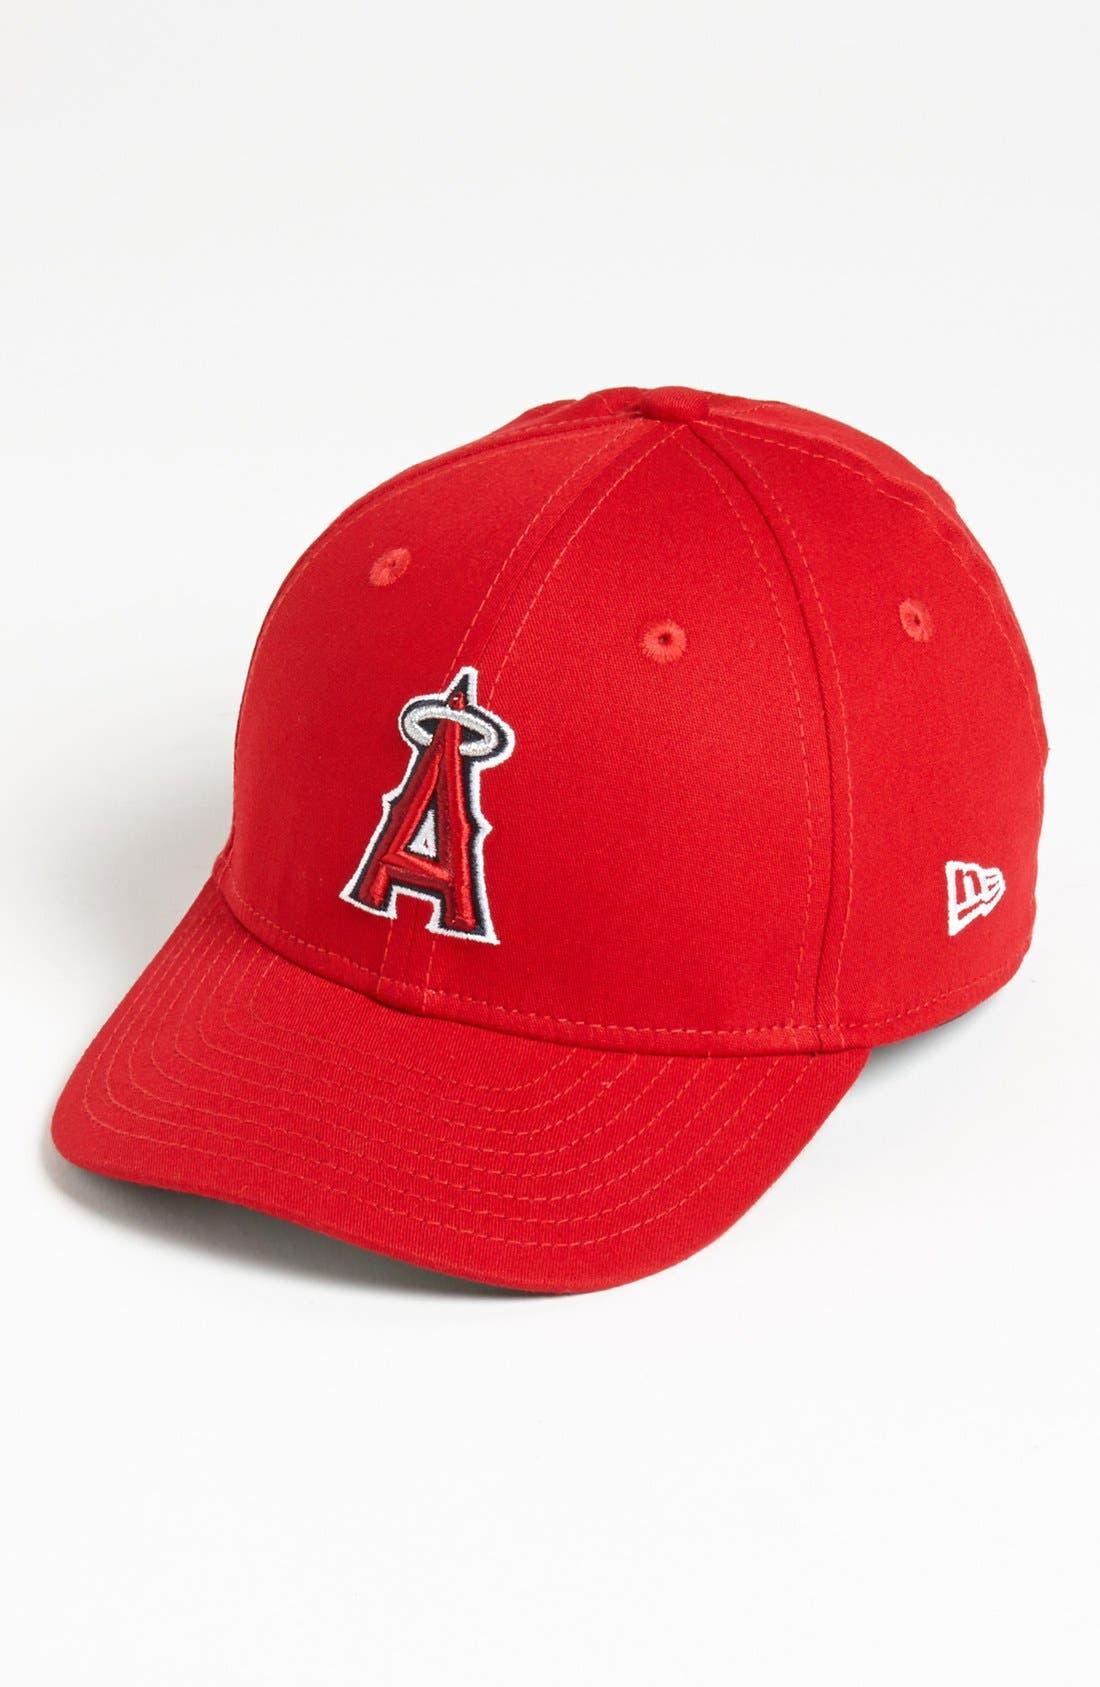 Alternate Image 1 Selected - New Era Cap 'Los Angeles Angels of Anaheim - Tie Breaker' Baseball Cap (Big Boys)